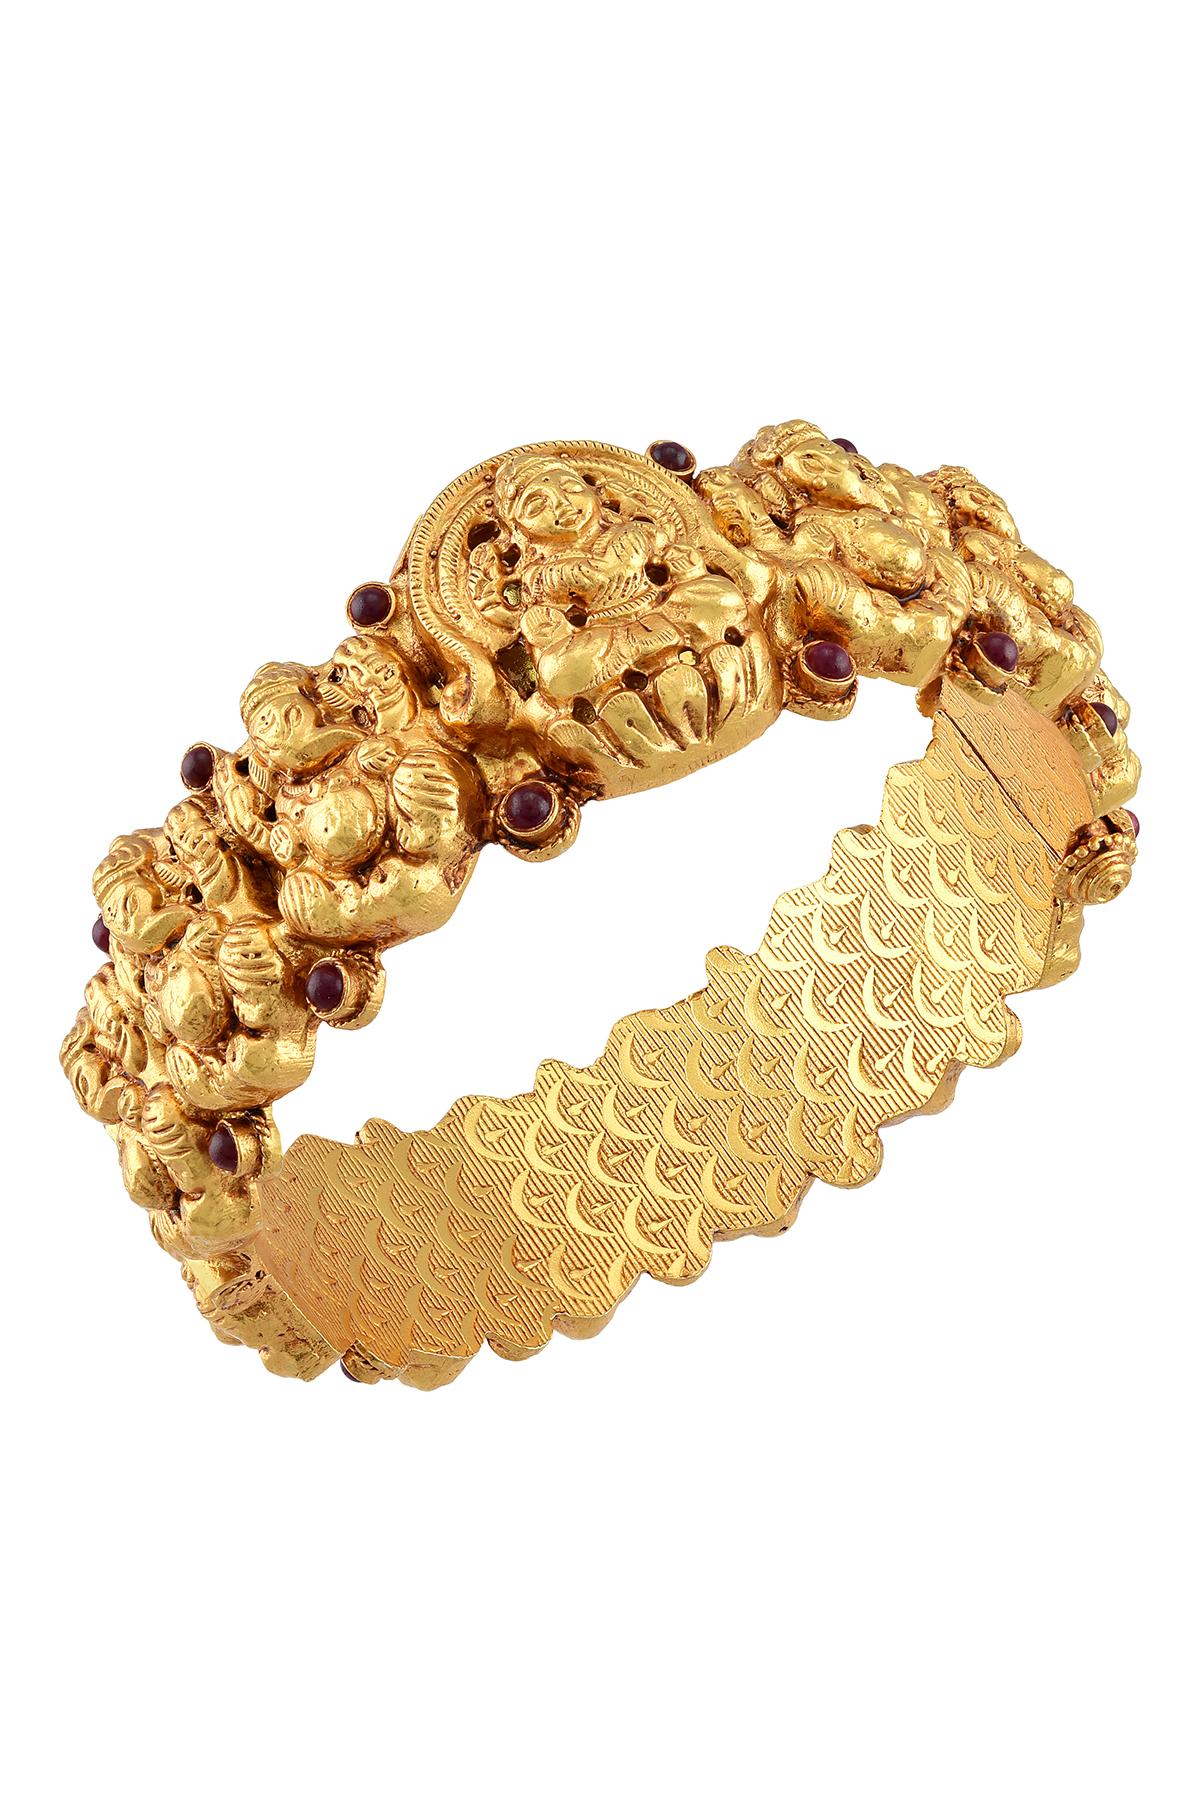 Silver Gold Plated Laxmi Ganesha Temple Style Bangle